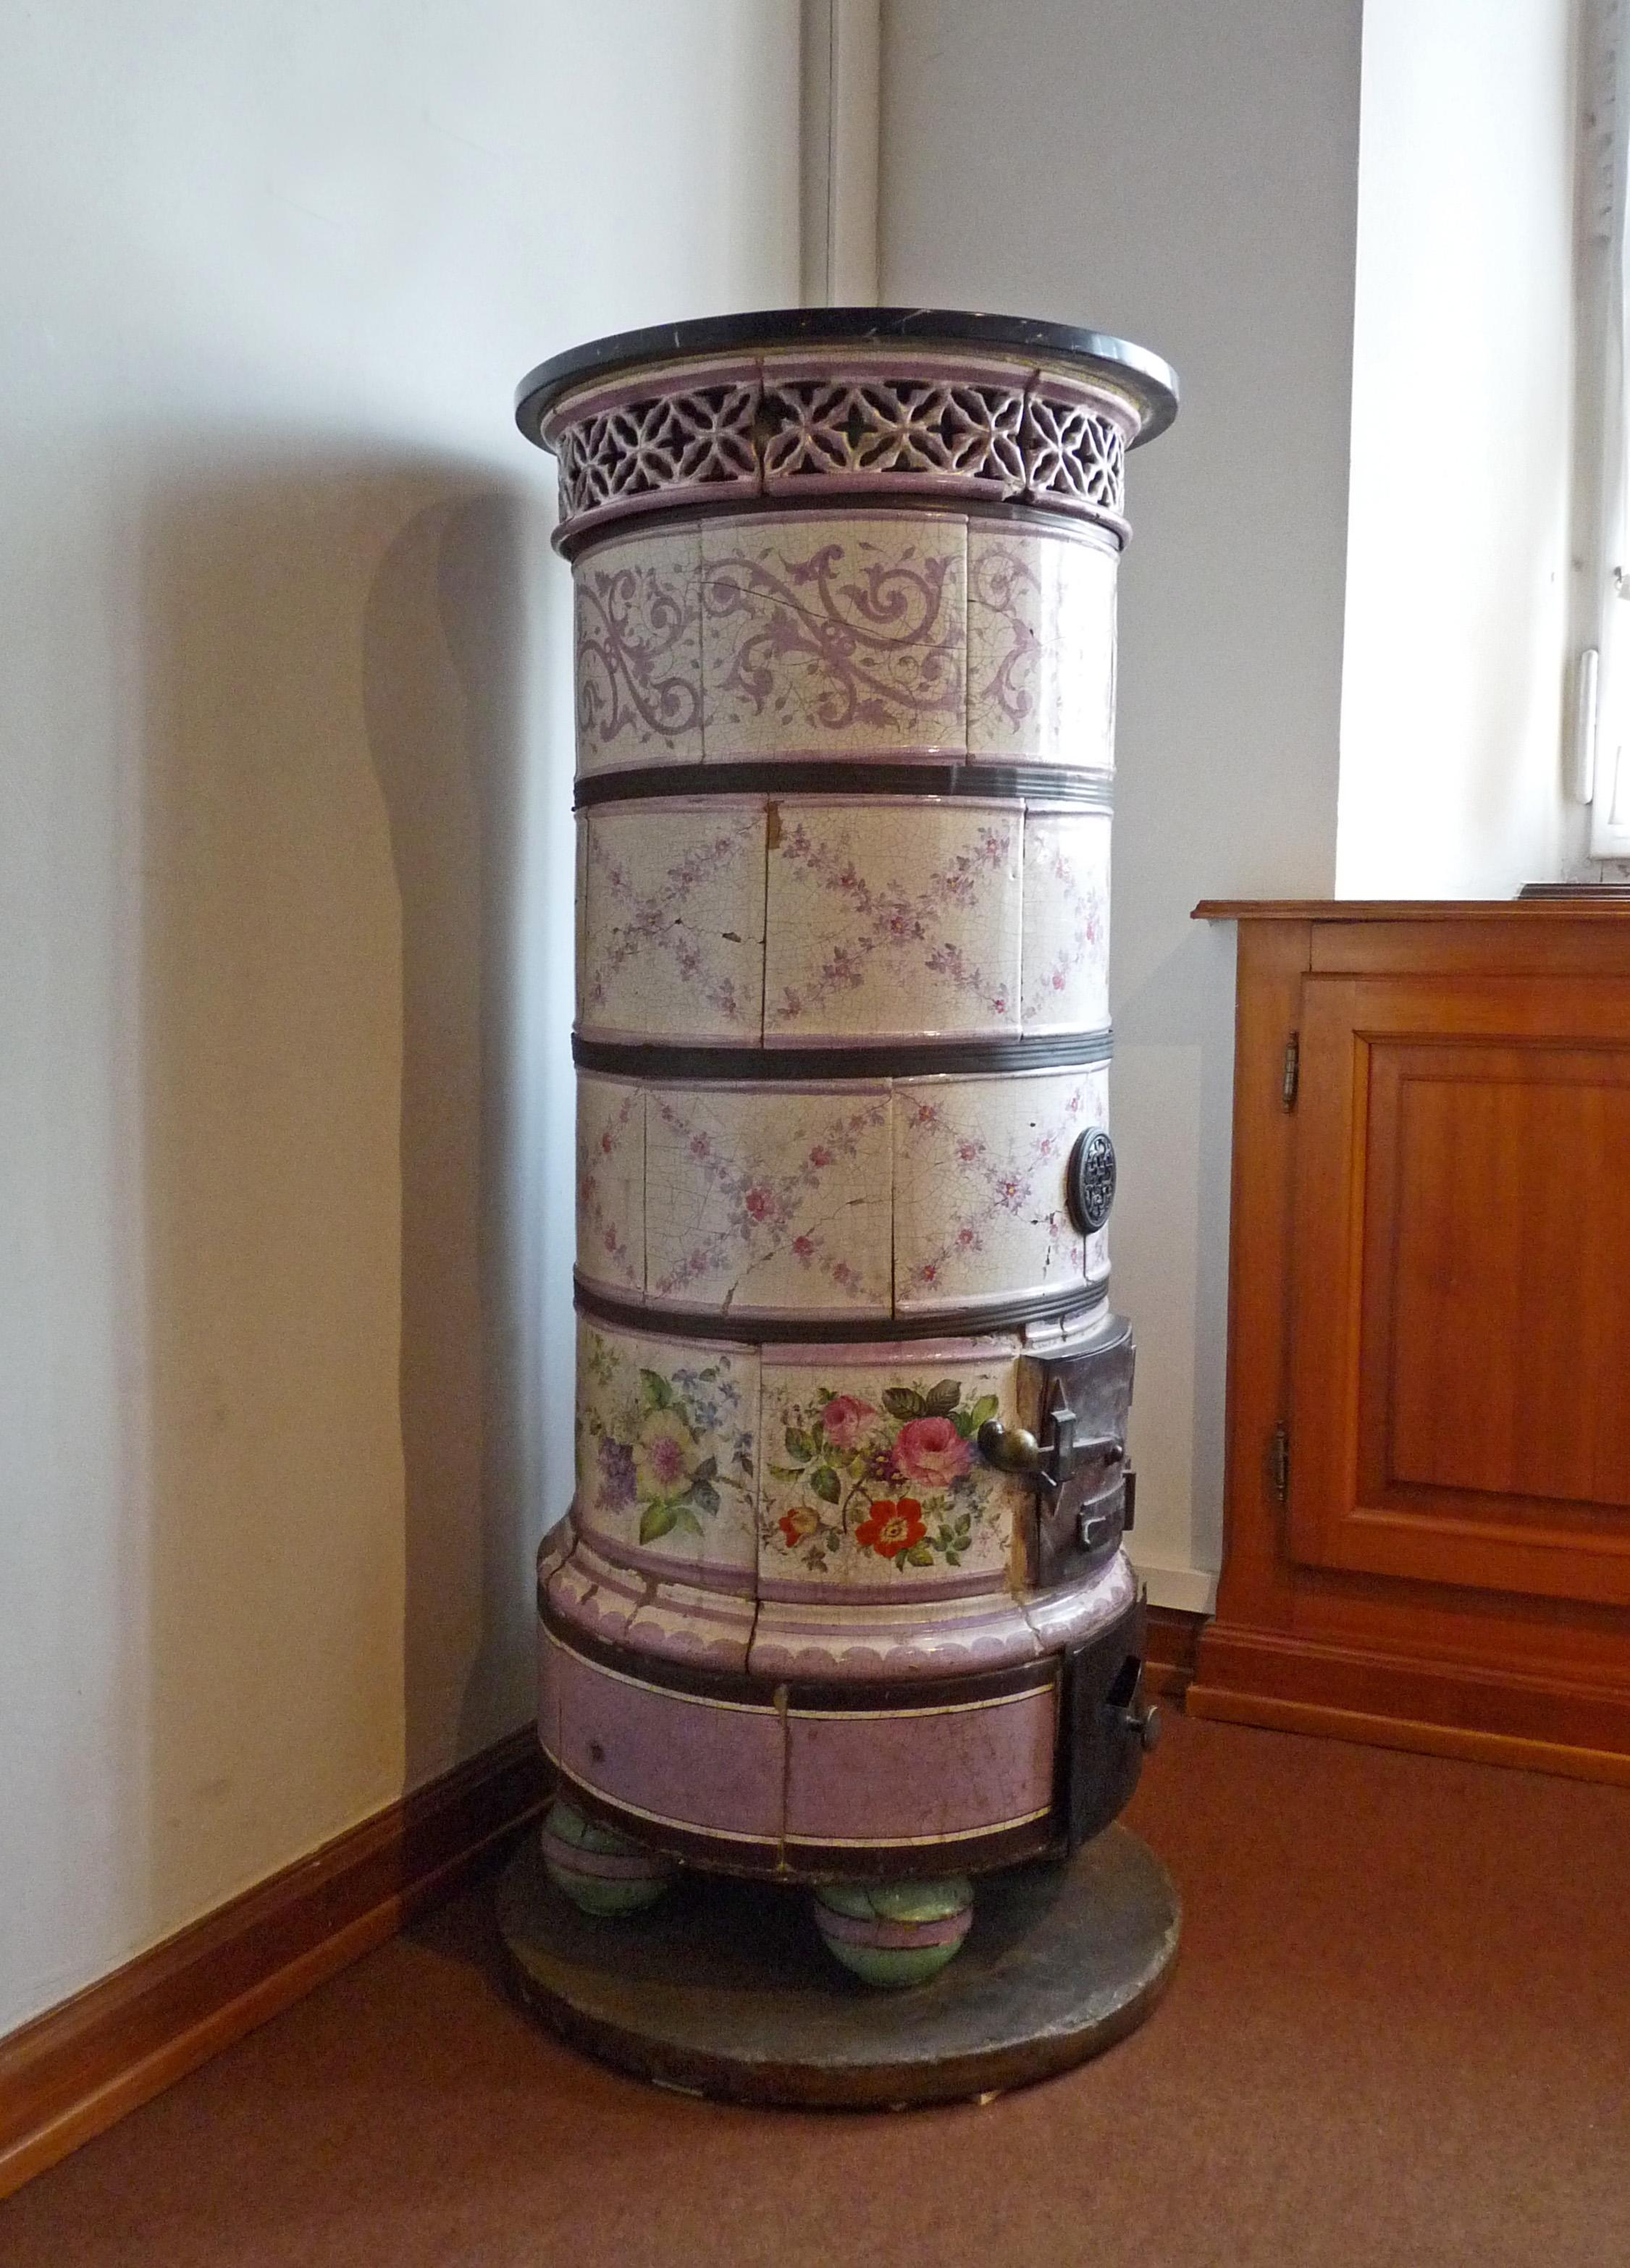 File po le rond en fa ence mus e alsacien de wikimedia commons - Lagostina poele ceramique ...